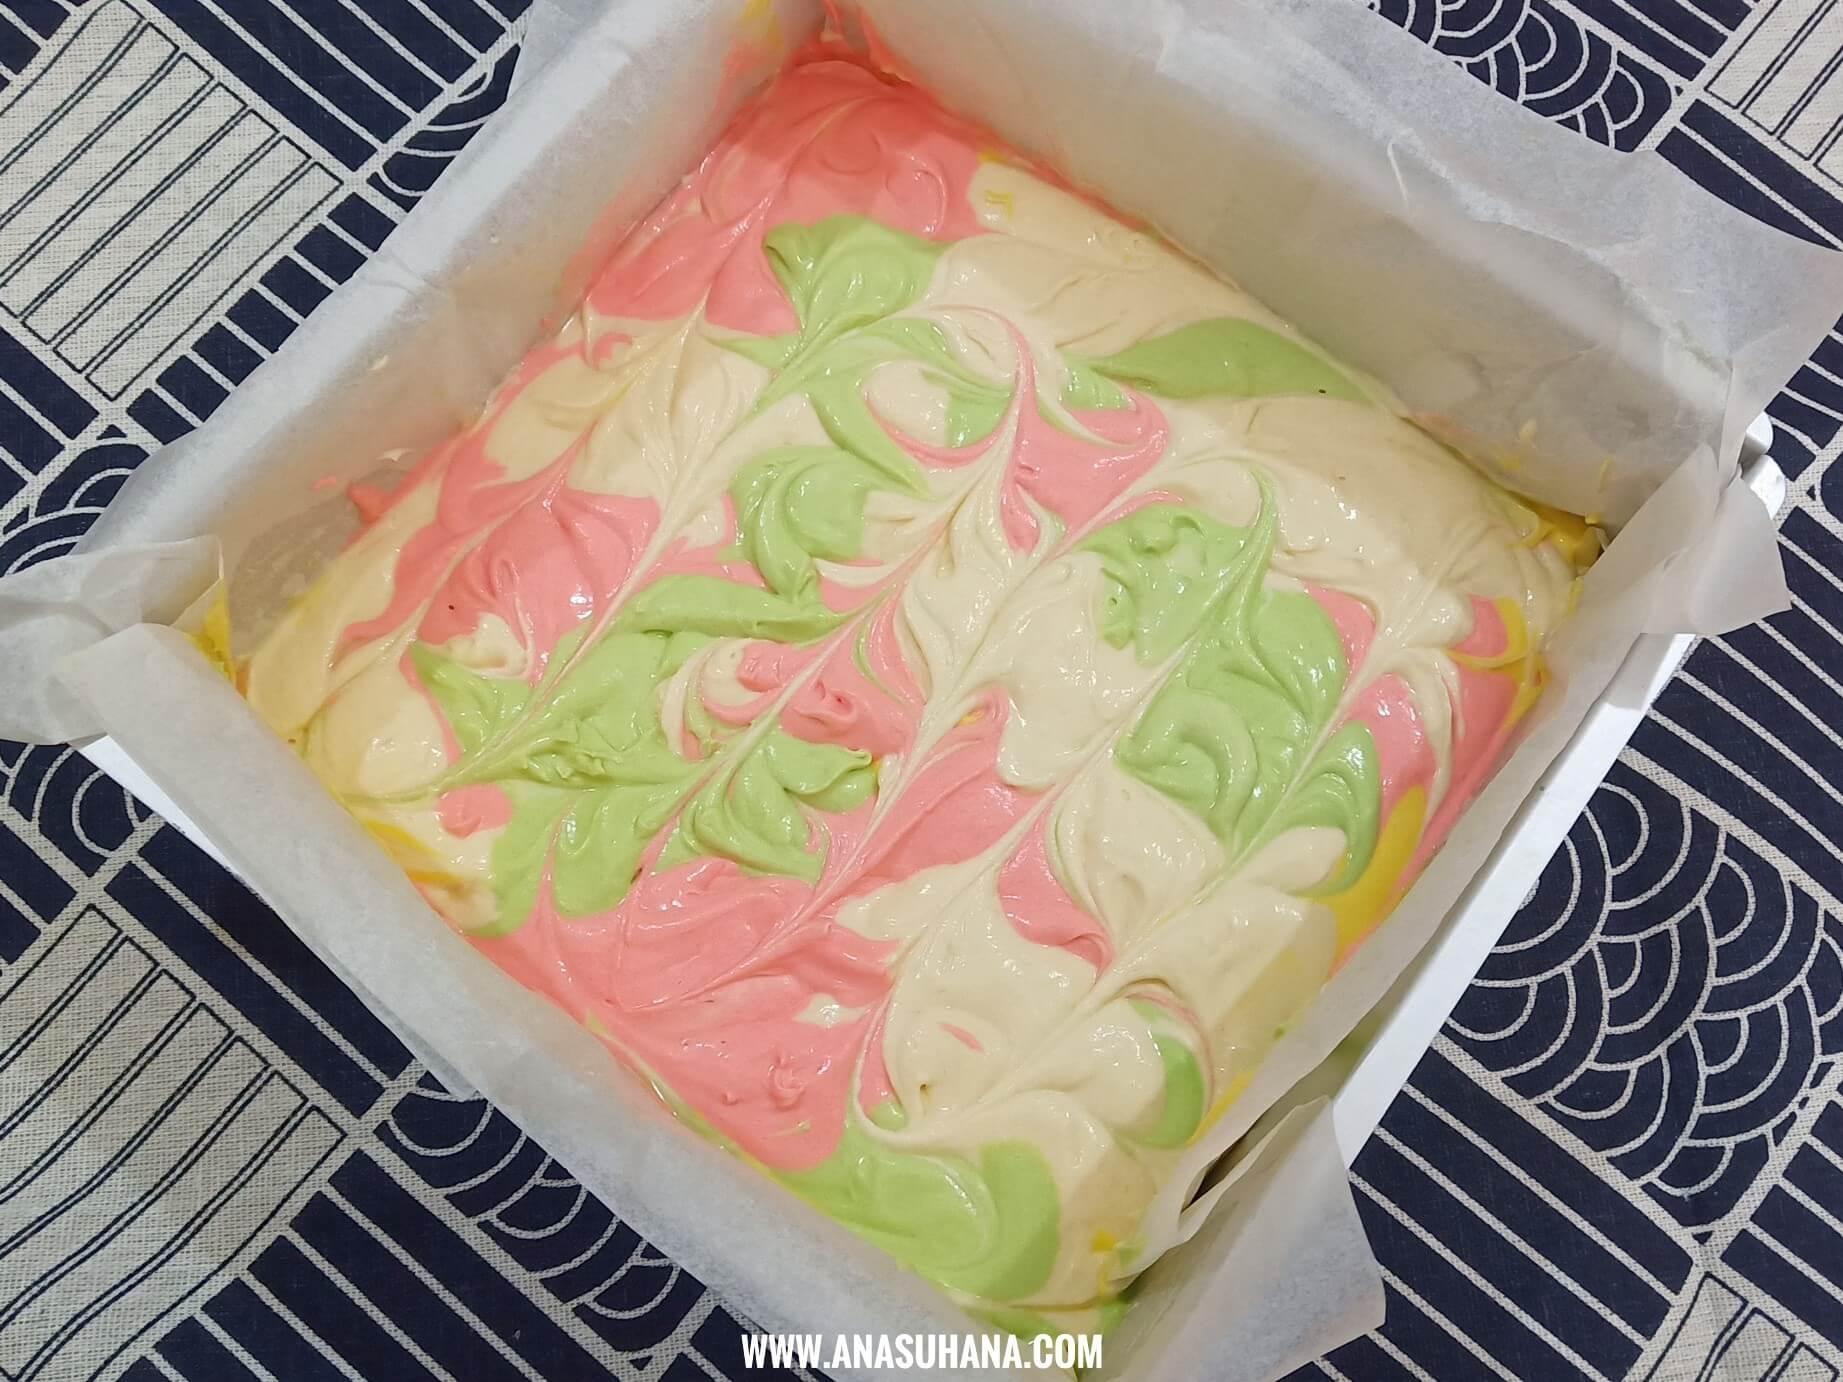 Resipi Kek Butter Marble Anti Gagal Yang Sedap dan Mudah Disediakan